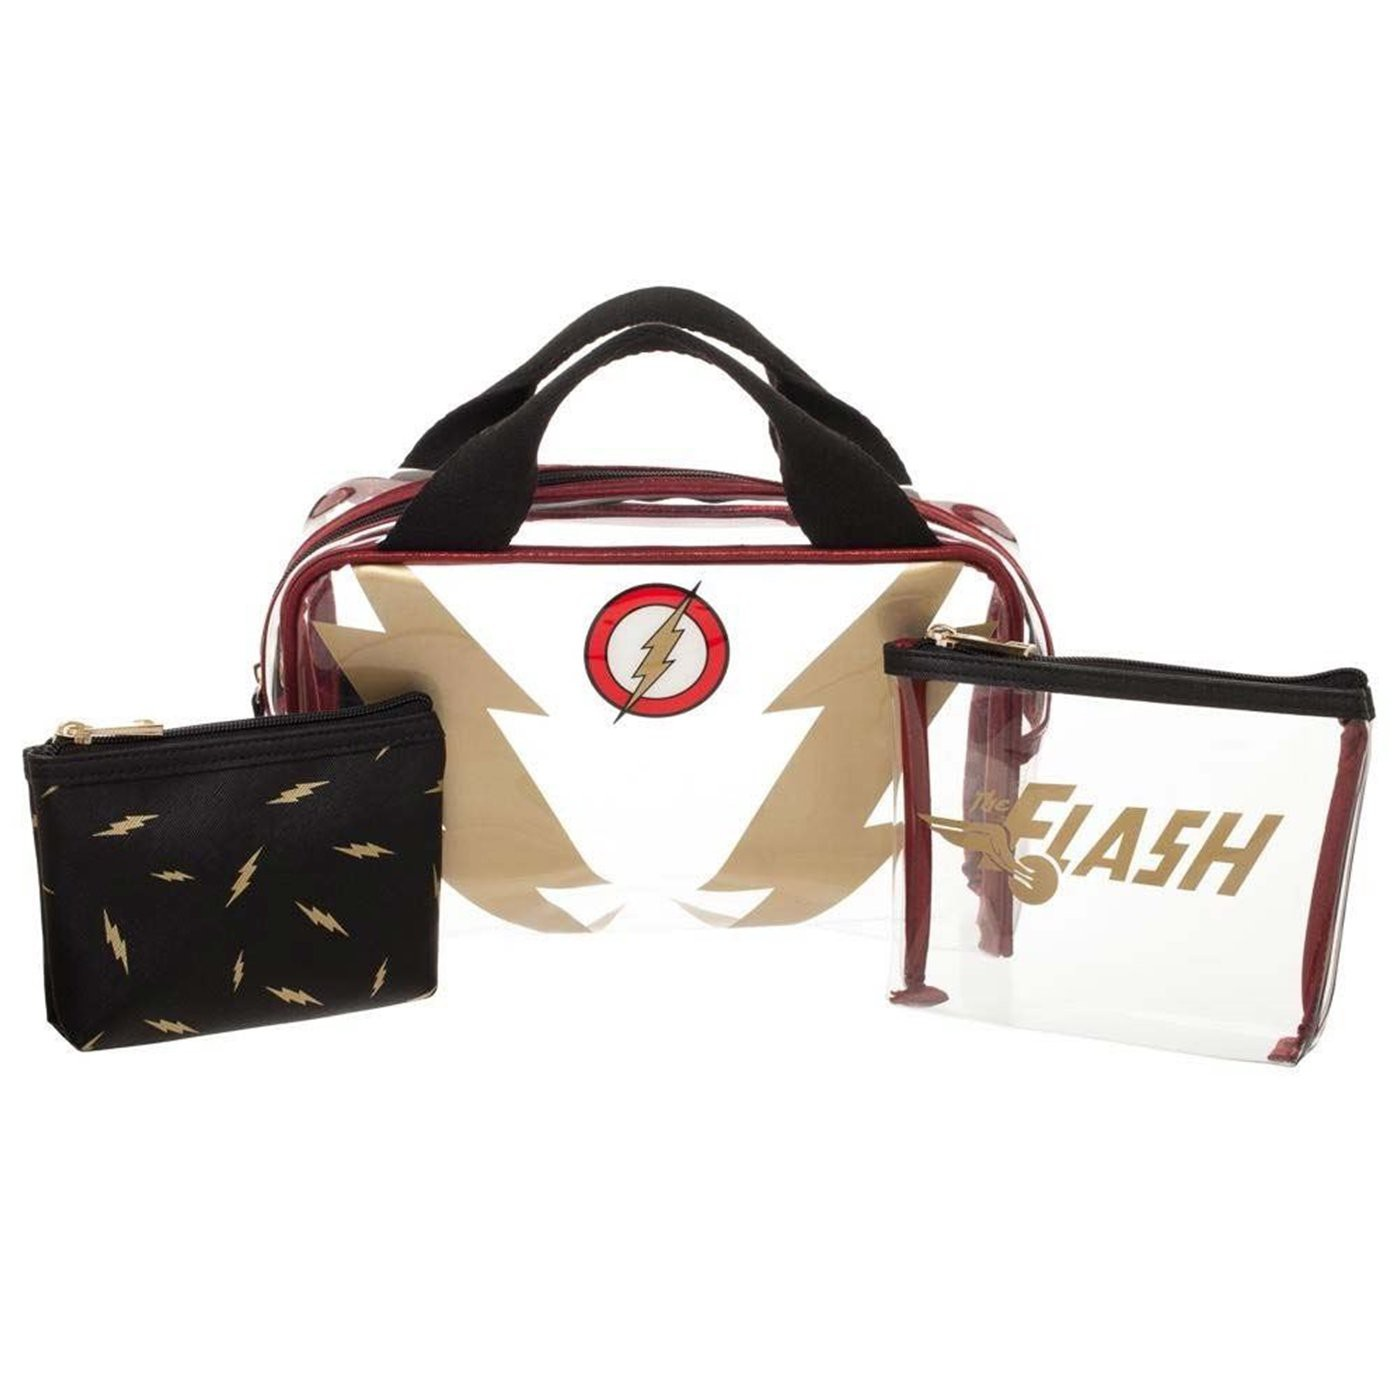 Flash 3 Piece Travel Set